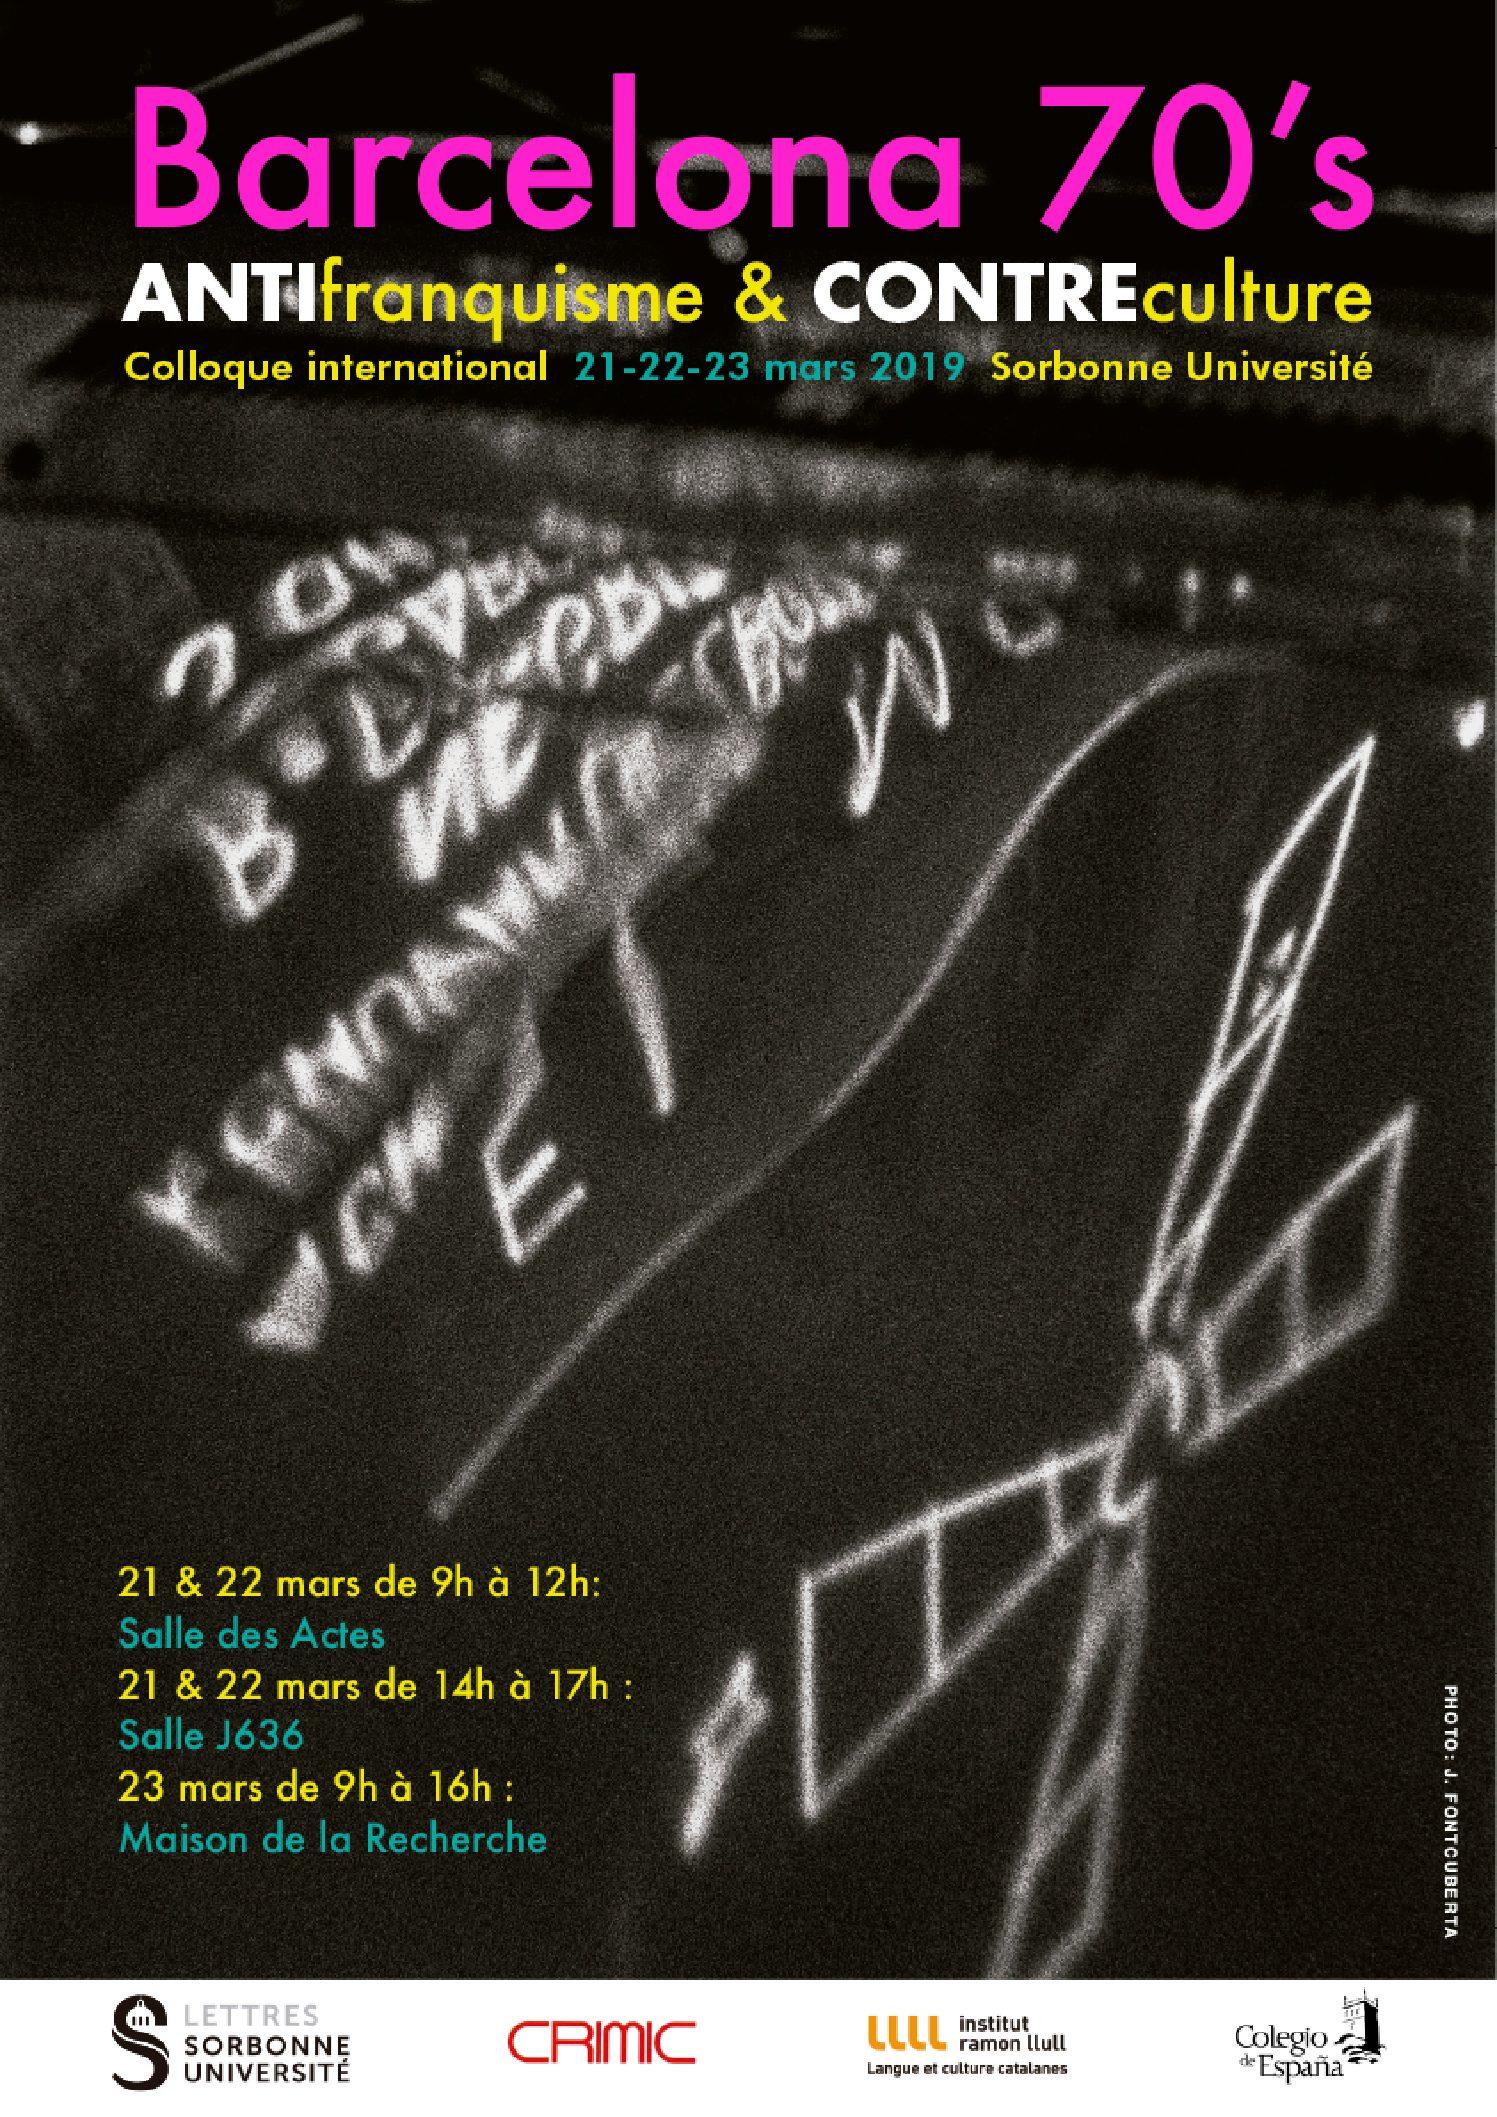 Barcelona 70's Antifranquisme & contreculture